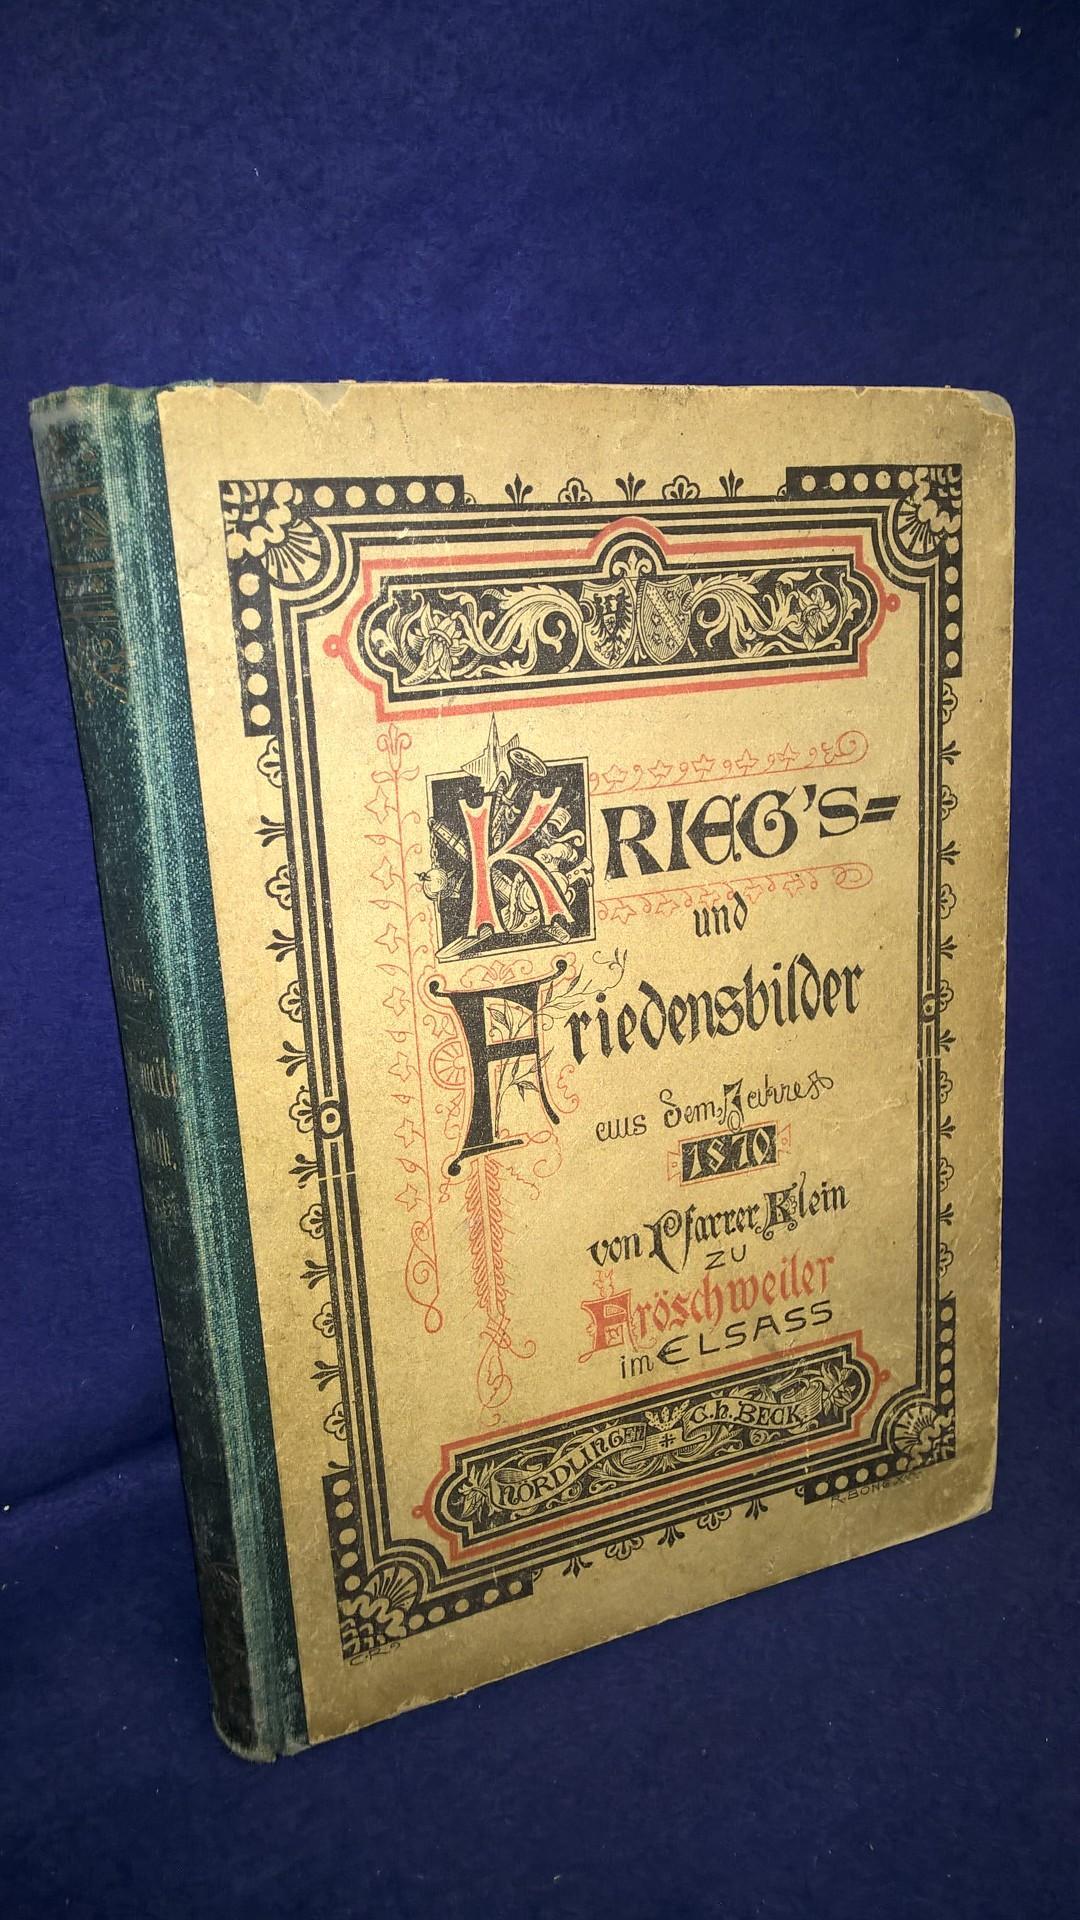 Fröschweiler Erinnerungen. Ergänzungsblätter zu Pfarrer Klein's Fröschweiler Chronik.